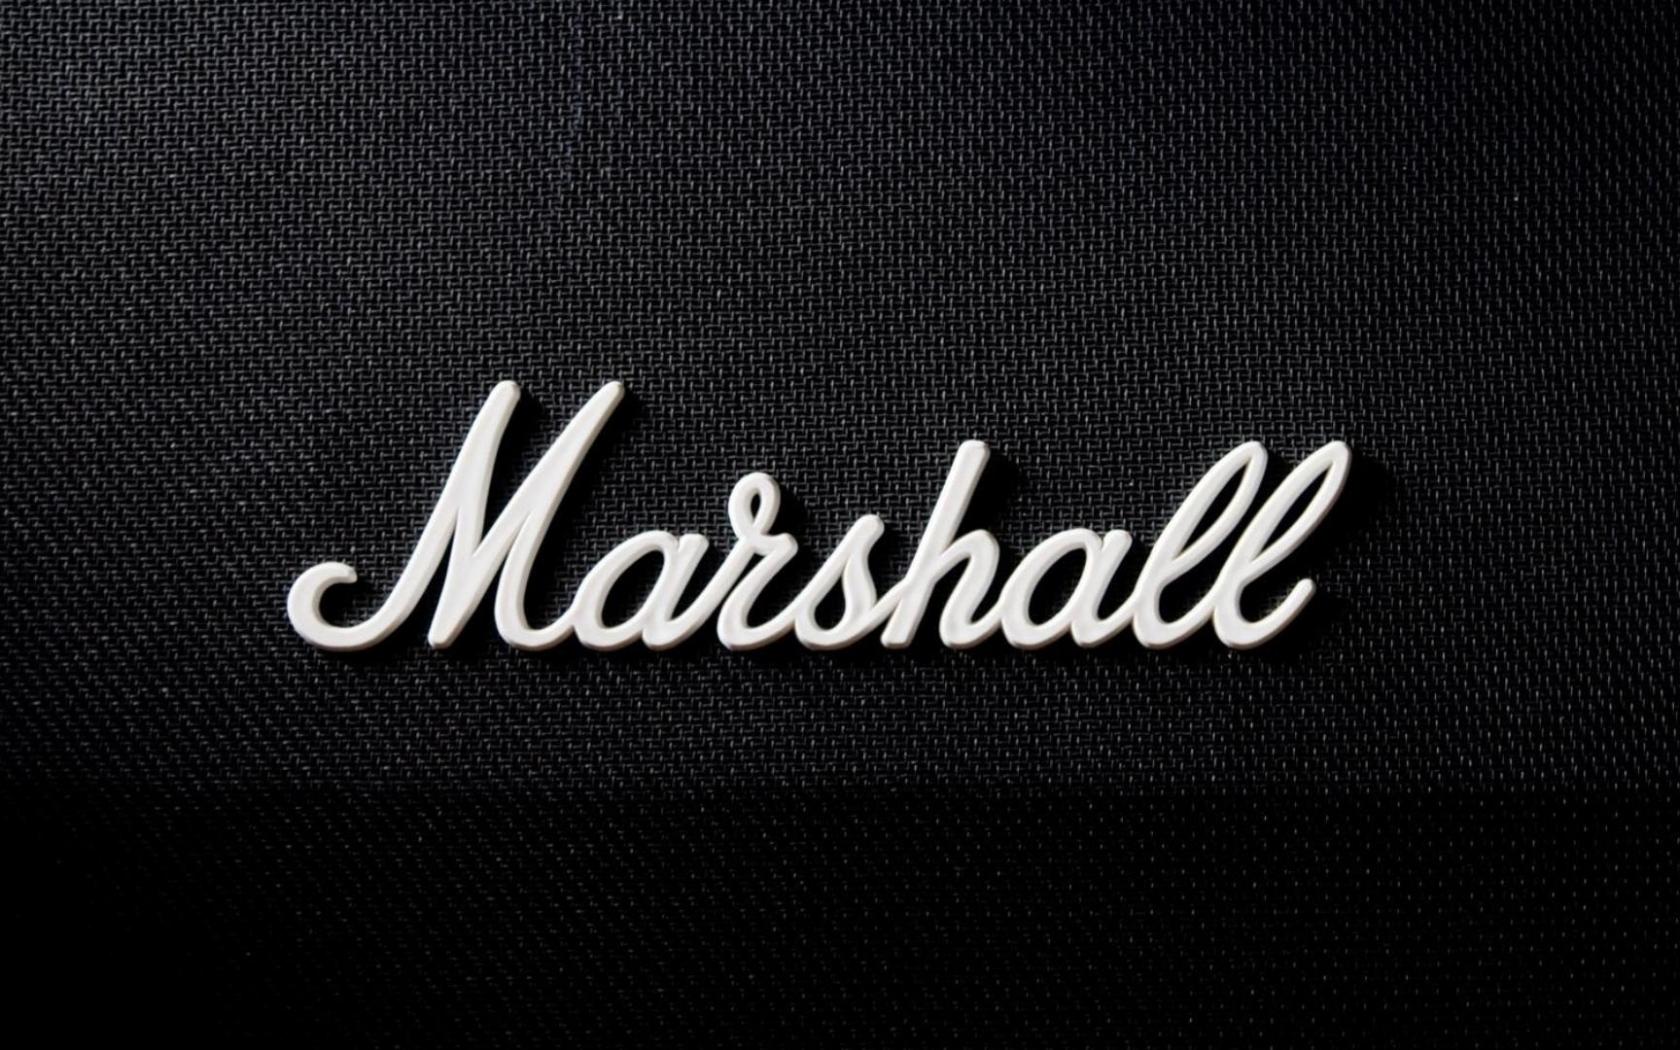 Marshall - 1680x1050